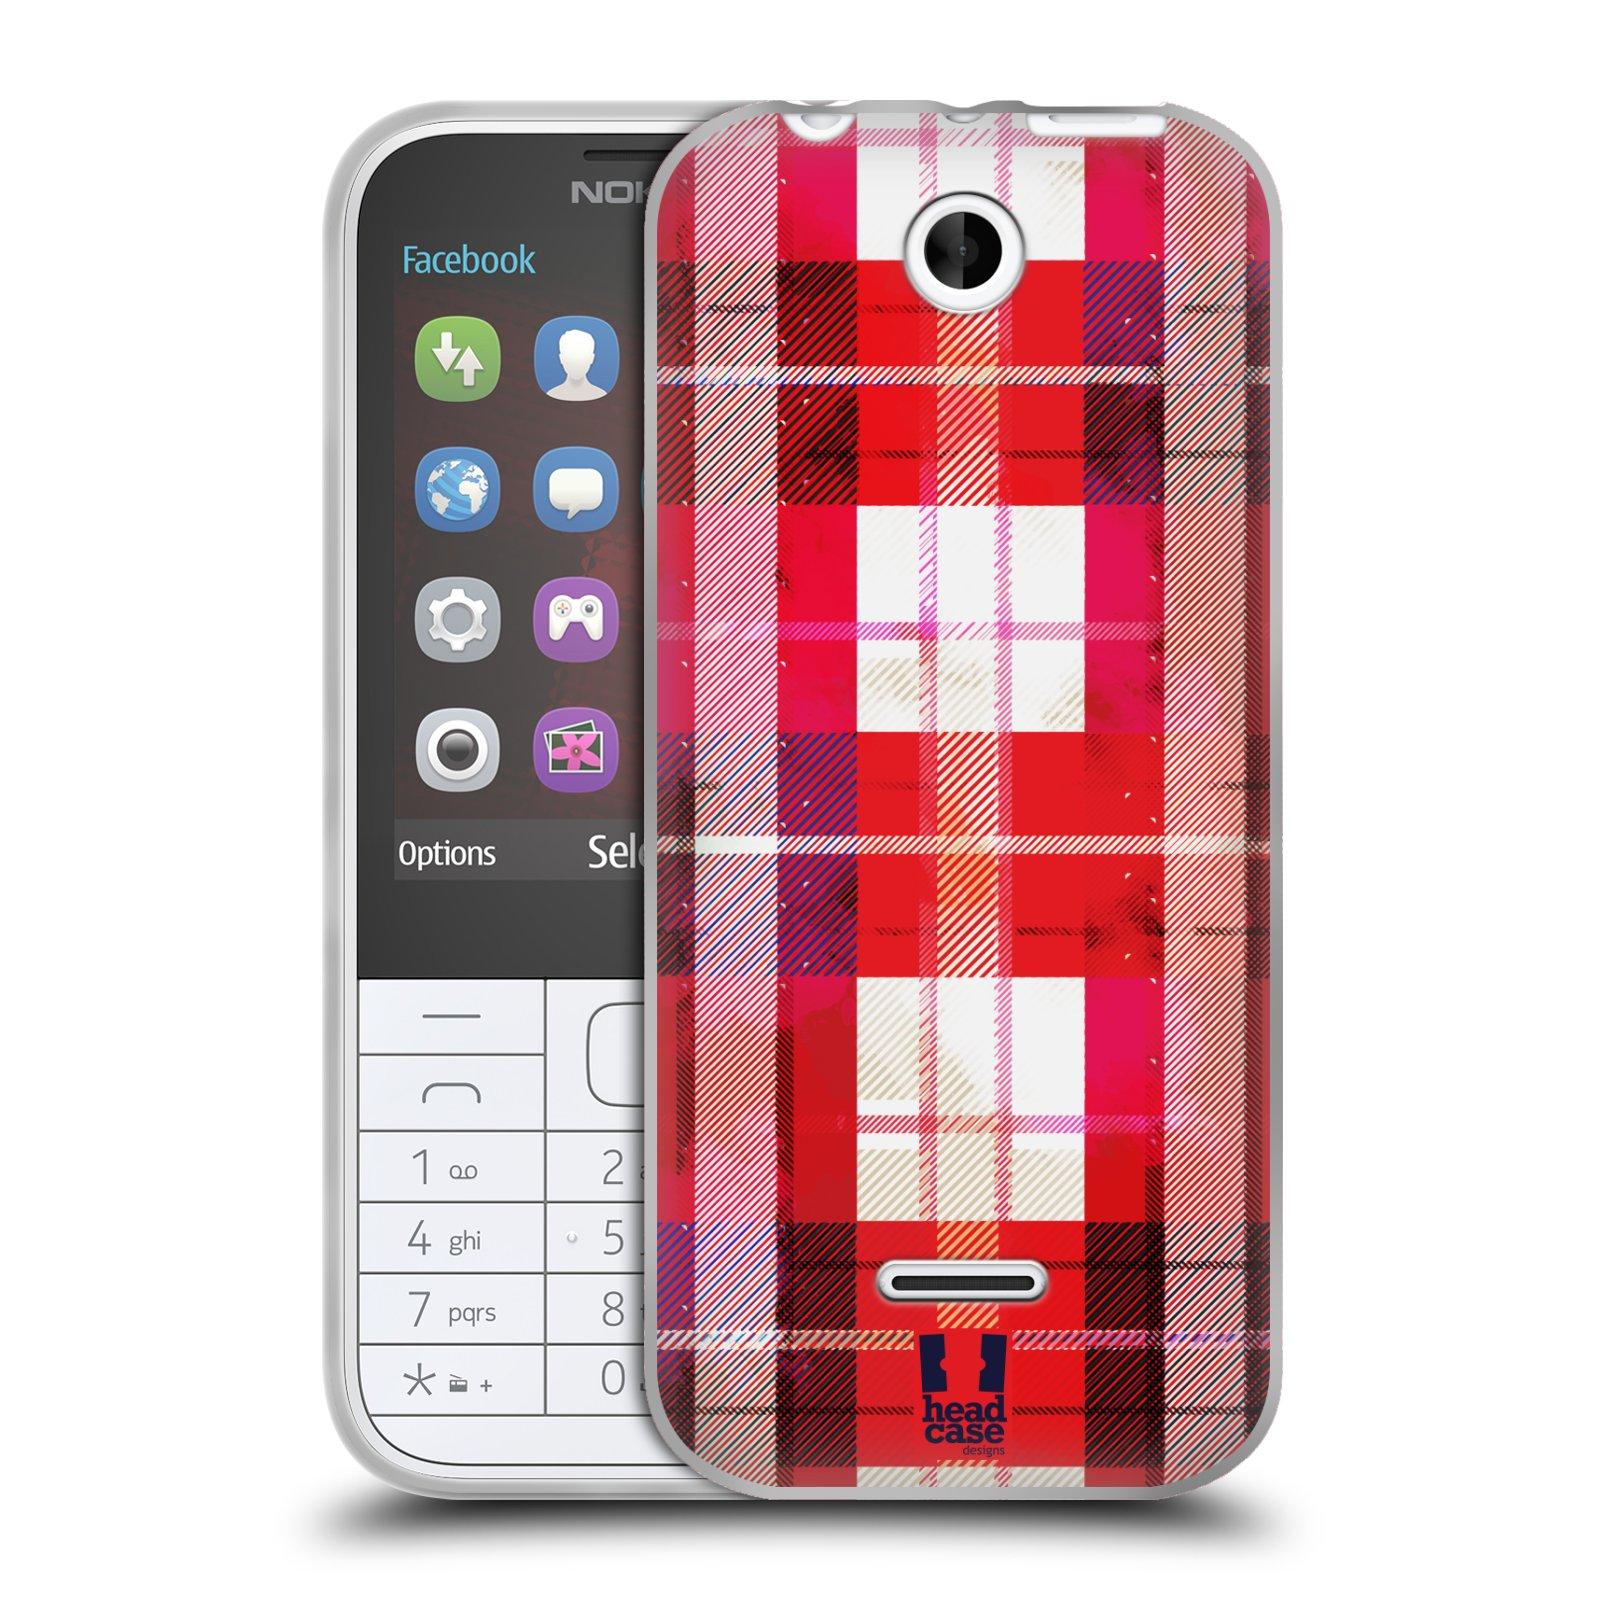 Silikonové pouzdro na mobil Nokia 225 HEAD CASE FLANEL RED (Silikonový kryt či obal na mobilní telefon Nokia 225)